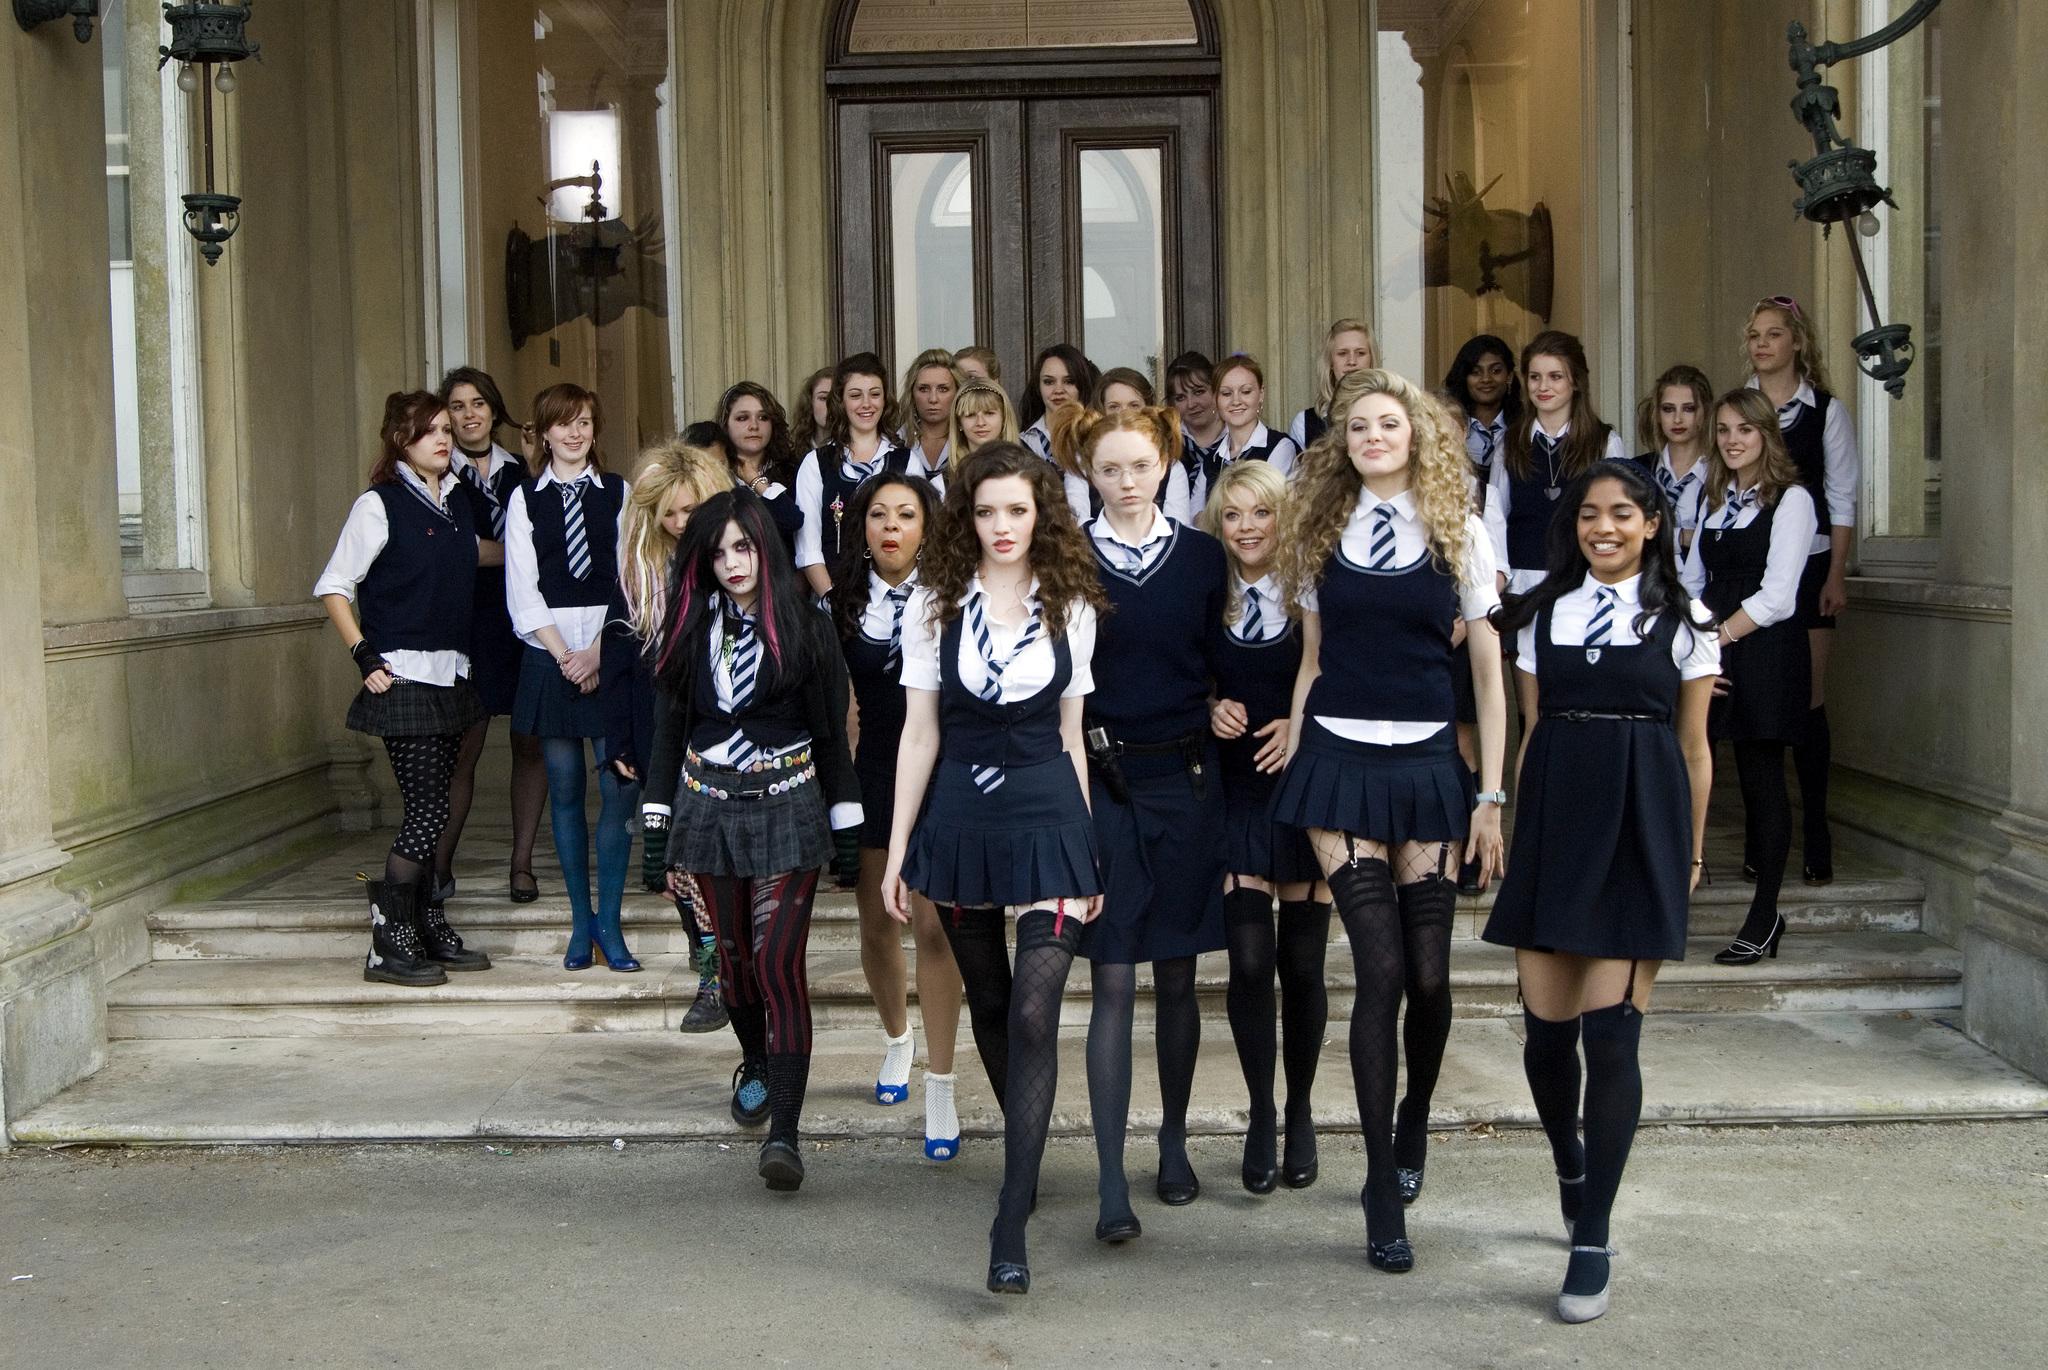 Kathryn Drysdale, Tamsin Egerton, Juno Temple, Talulah Riley, Antonia Bernath, Lily Cole, Amara Karan, and Paloma Faith in St. Trinian's (2007)